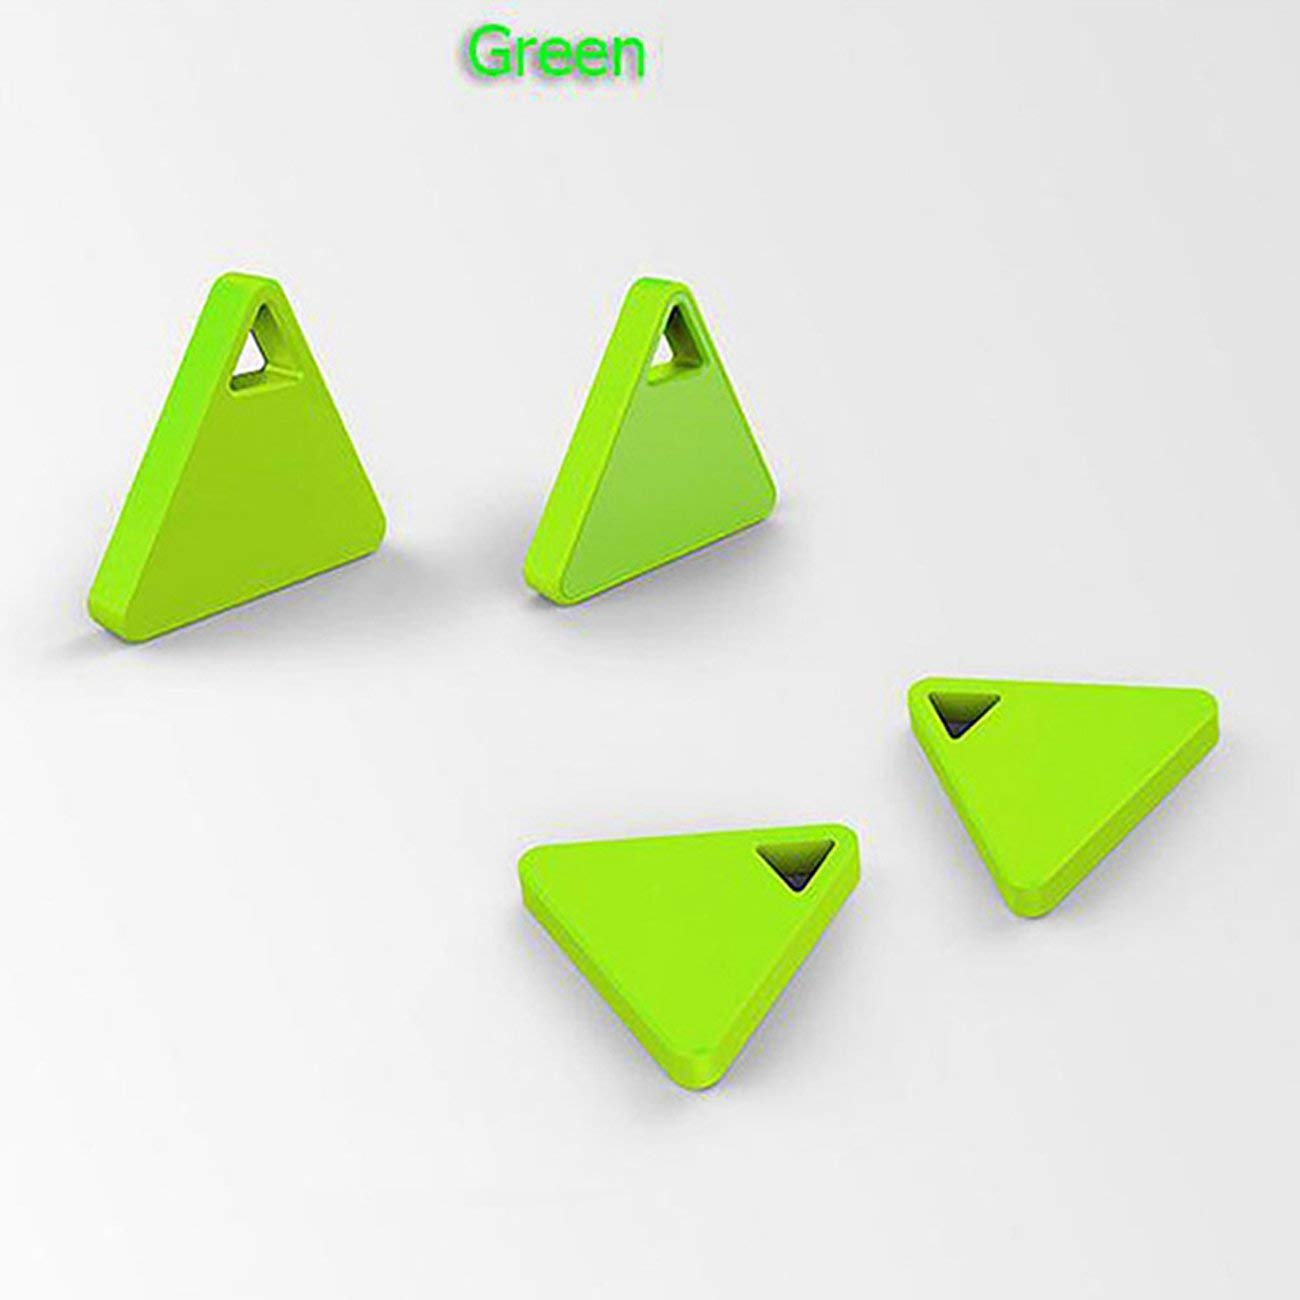 GerTong 1PCS Bluetooth Smart Mini Tag Tracker Pet Child Wallet Key Finder GPS Locator Alarm & Remote Control Phone Self-TimerAnti-lost Tracker Device Green